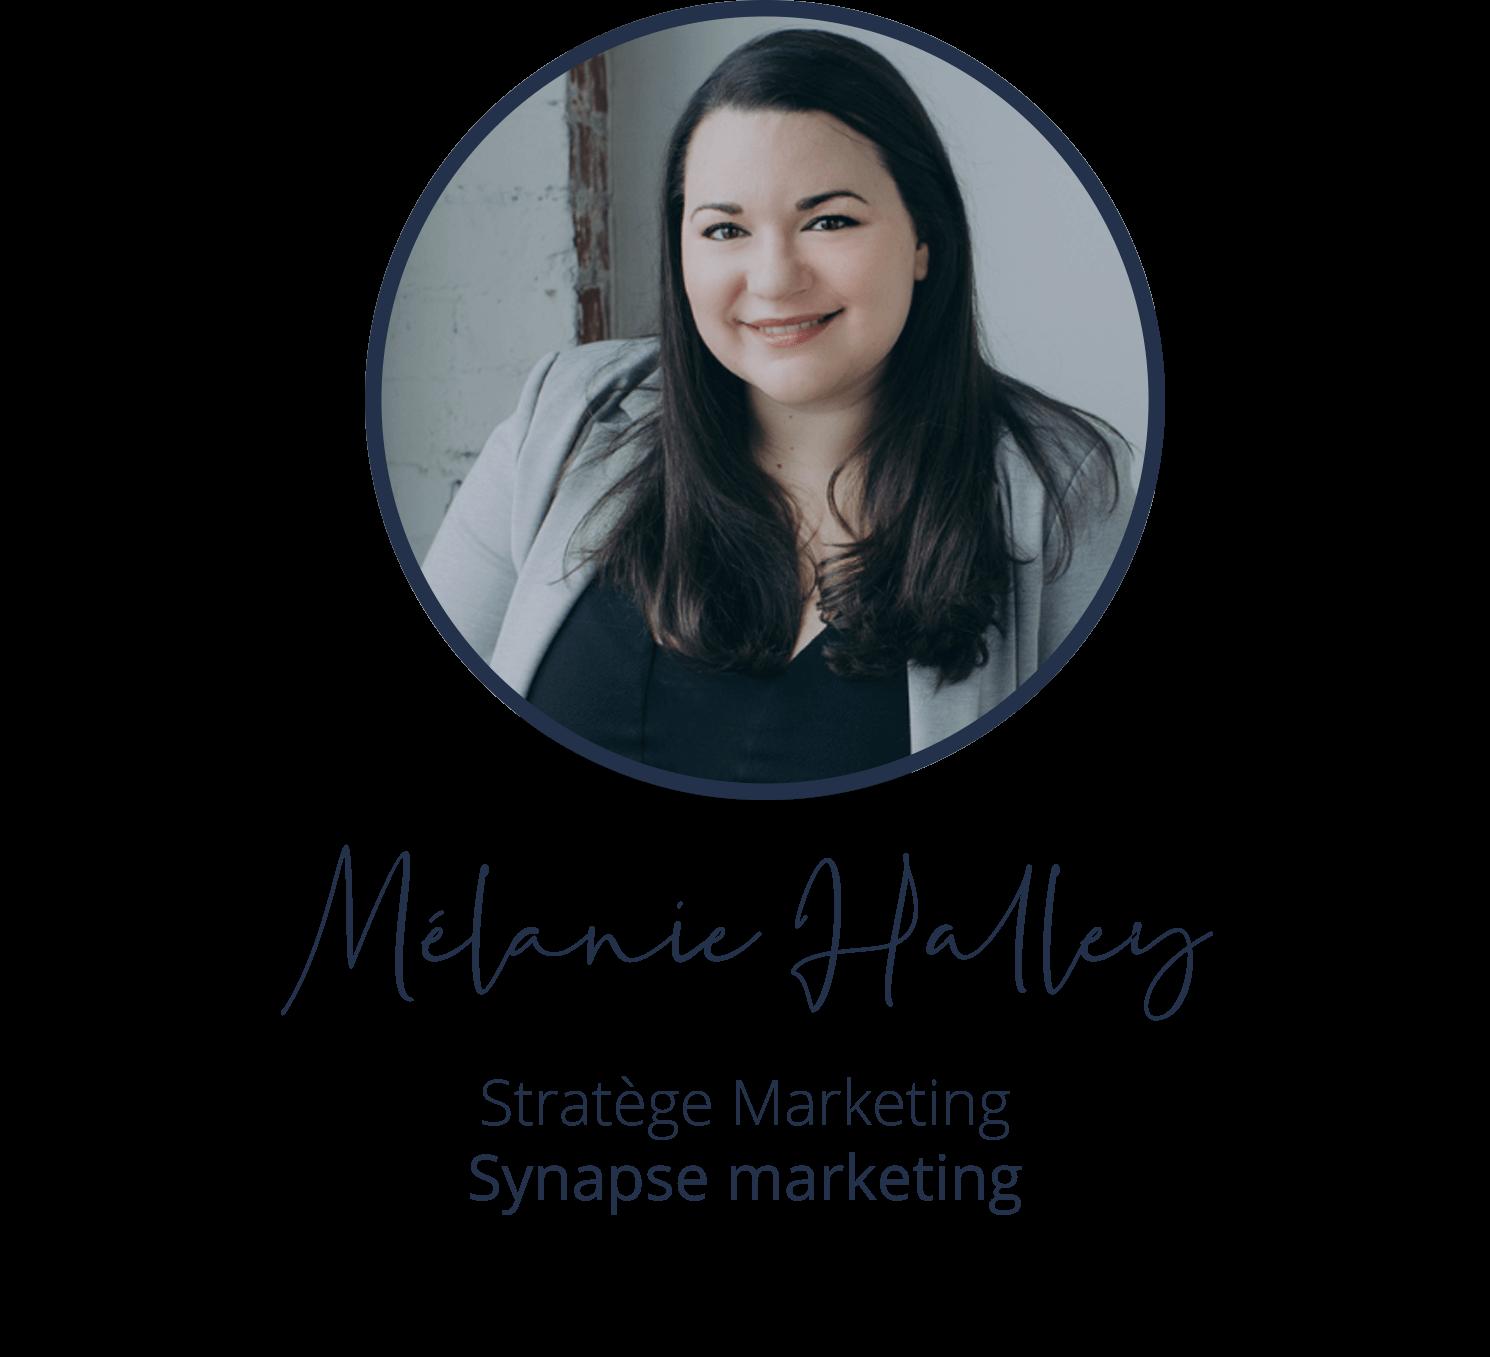 Mélanie Halley, Stratège Marketing, Synapse marketing